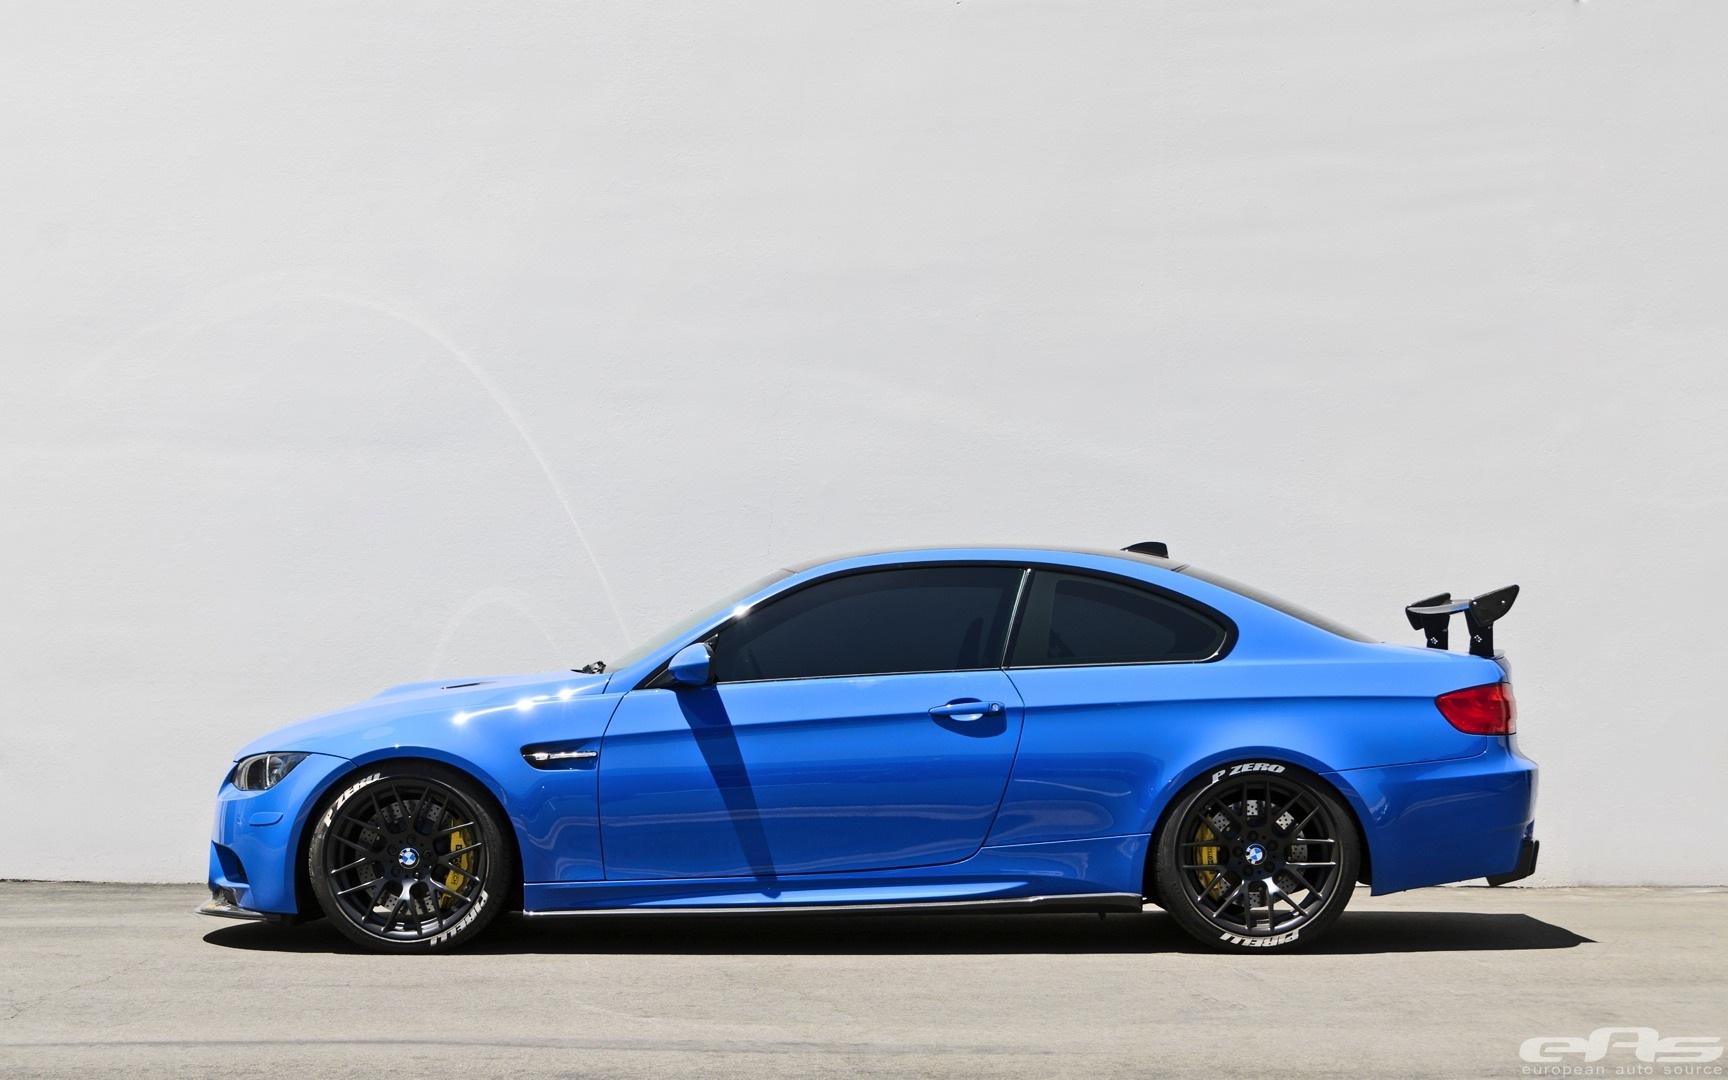 Santorini Blue Bmw E92 M3 Gets Serious At Eas Autoevolution